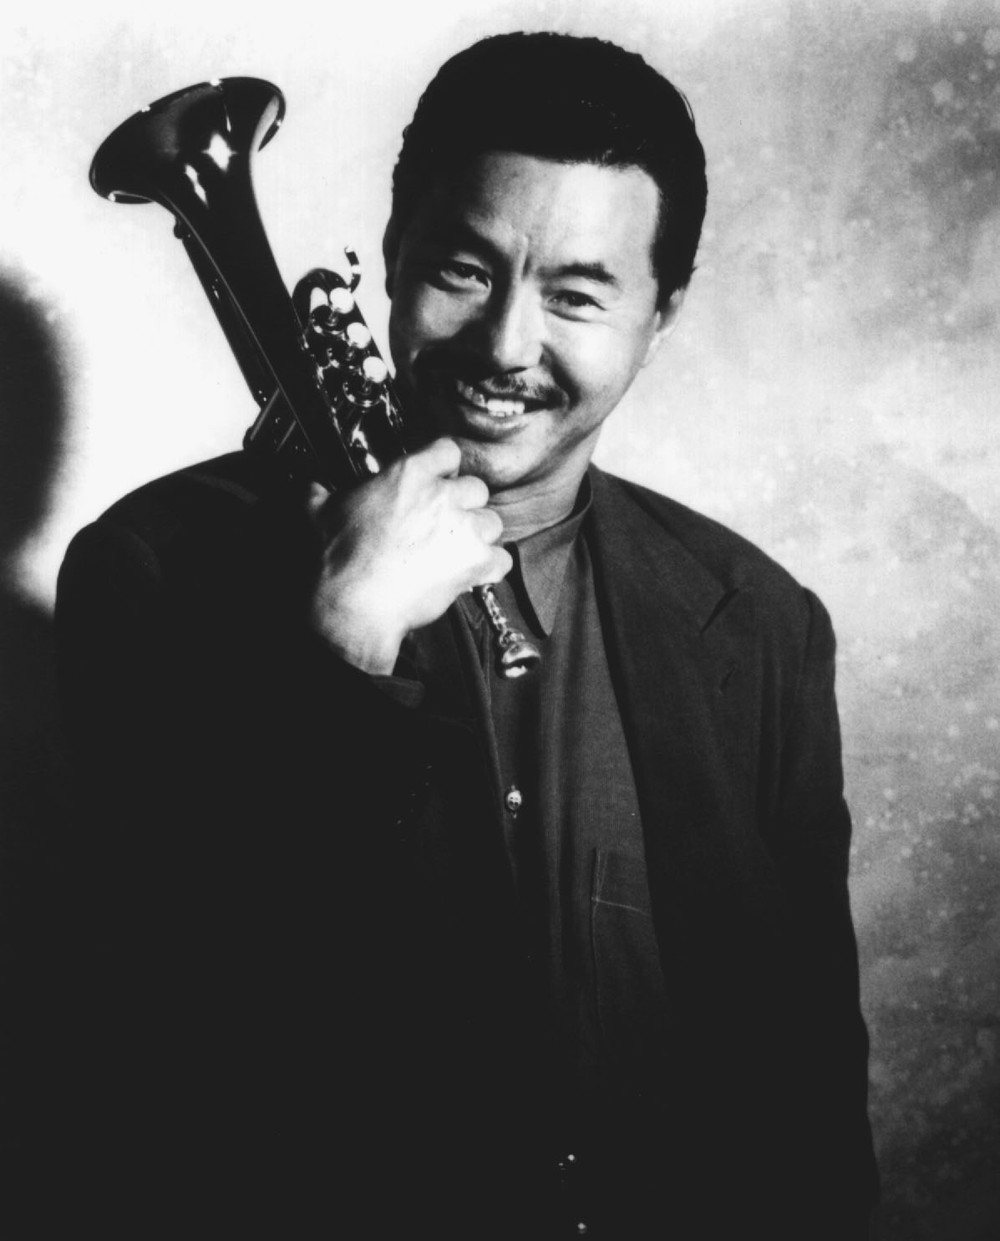 Terumasa Hino, b. 1942